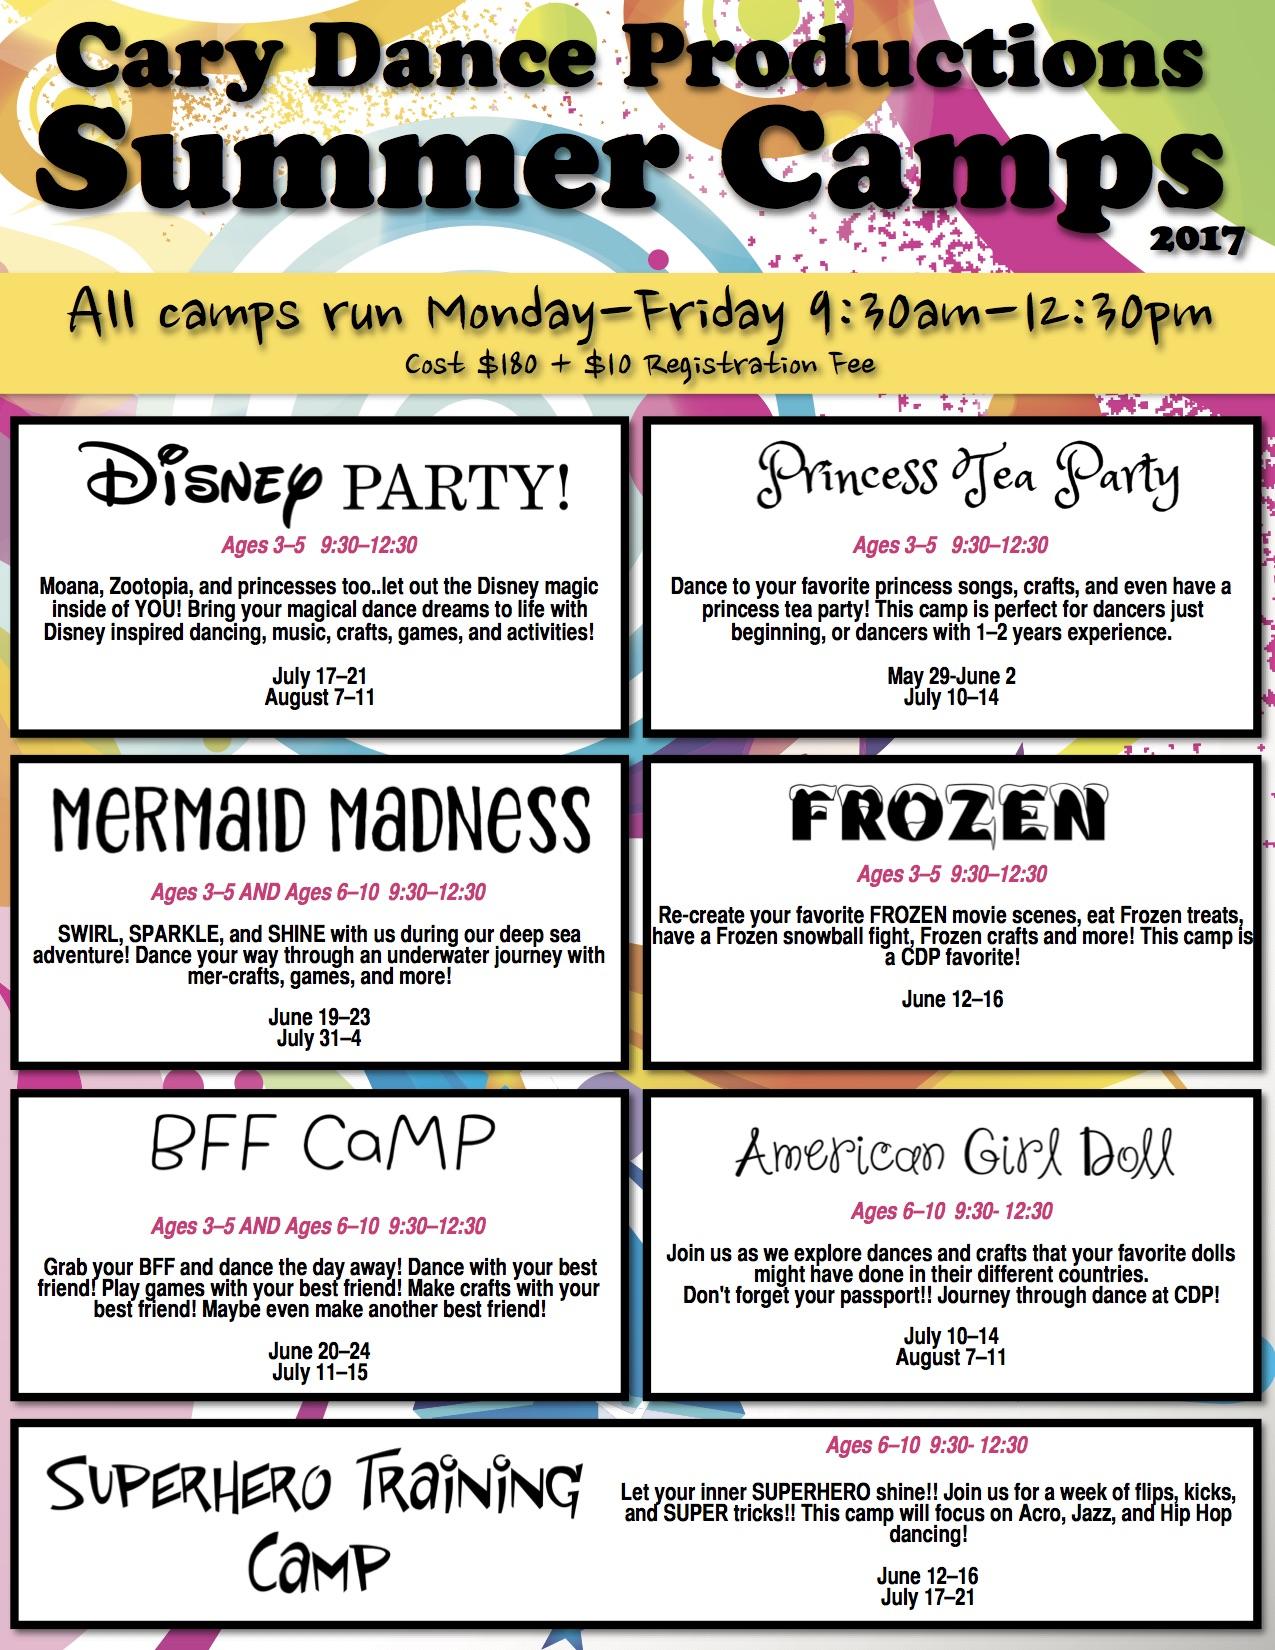 Beautiful Summer Camp Flyer Pattern - FORTSETZUNG ARBEITSBLATT ...